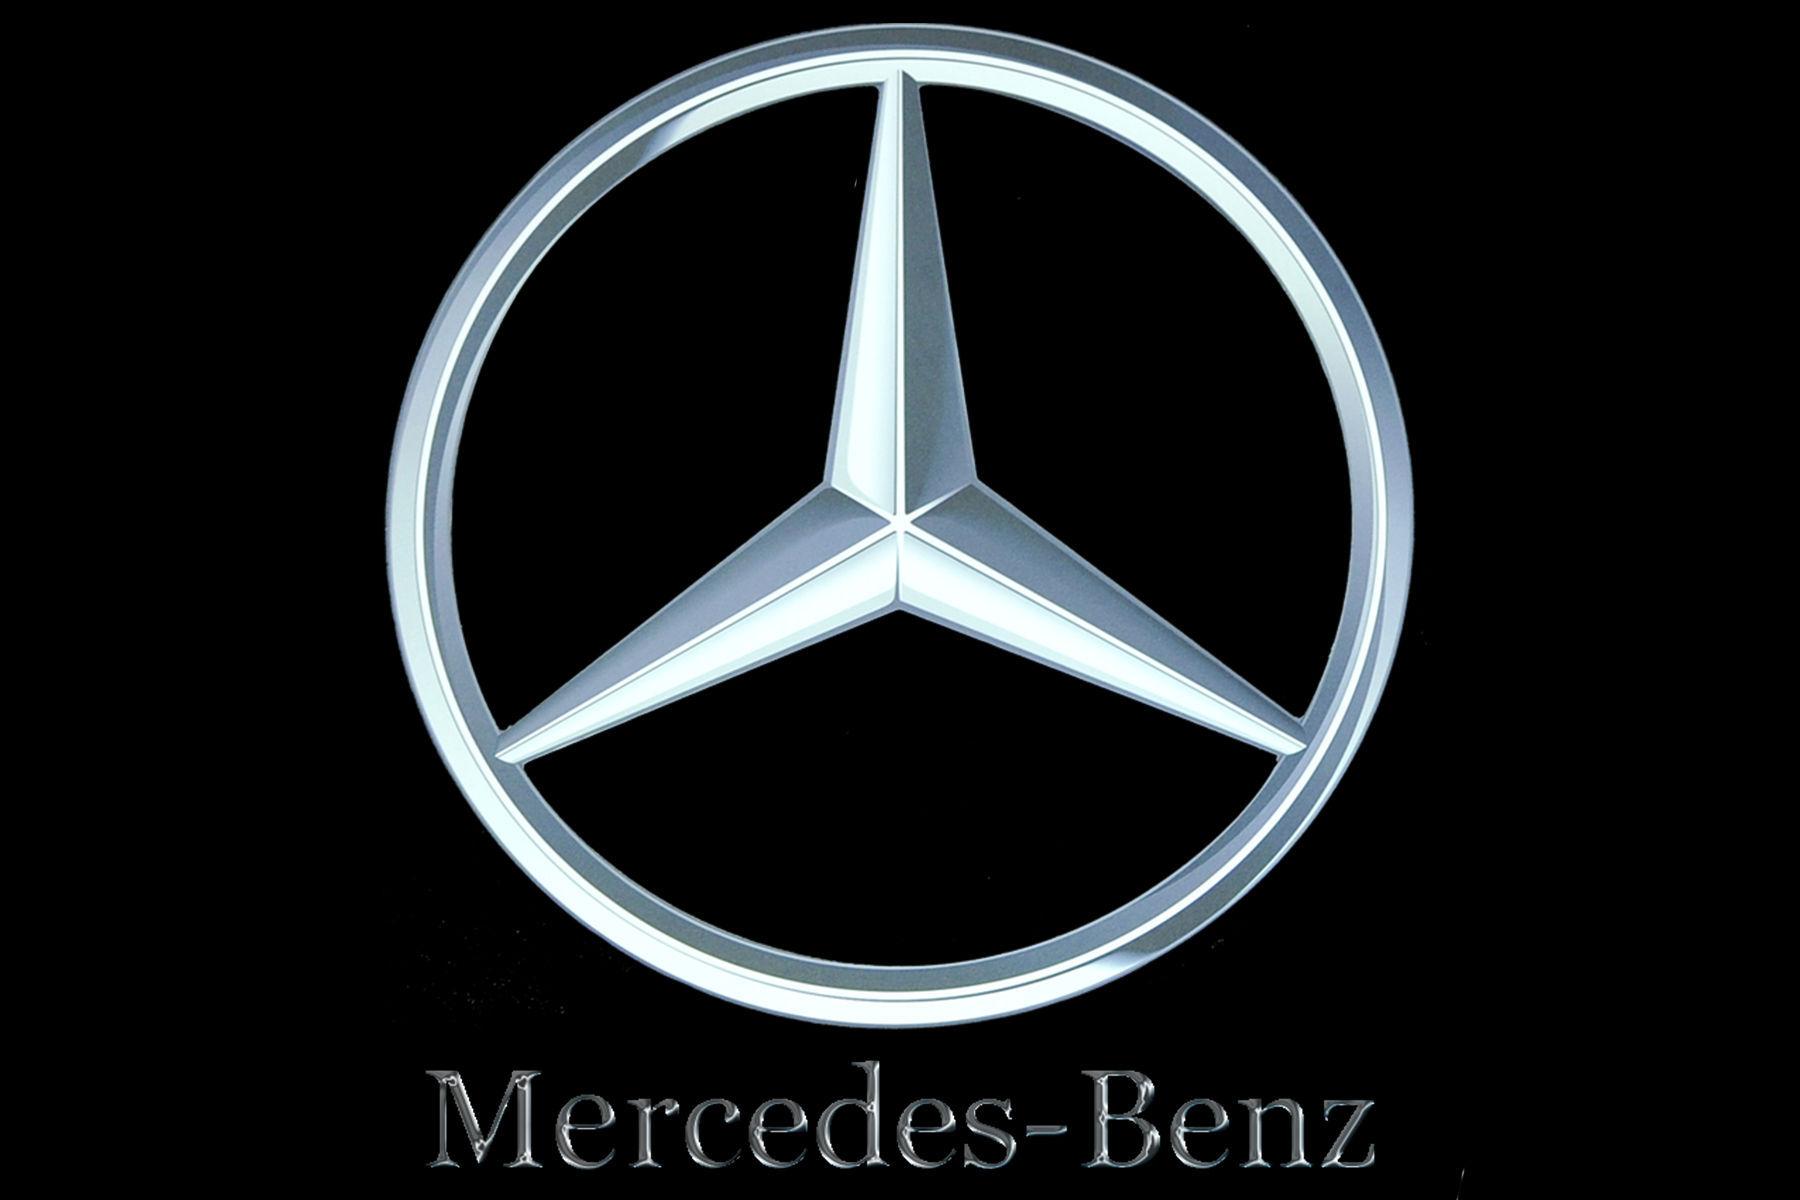 | Mercedes-Benz